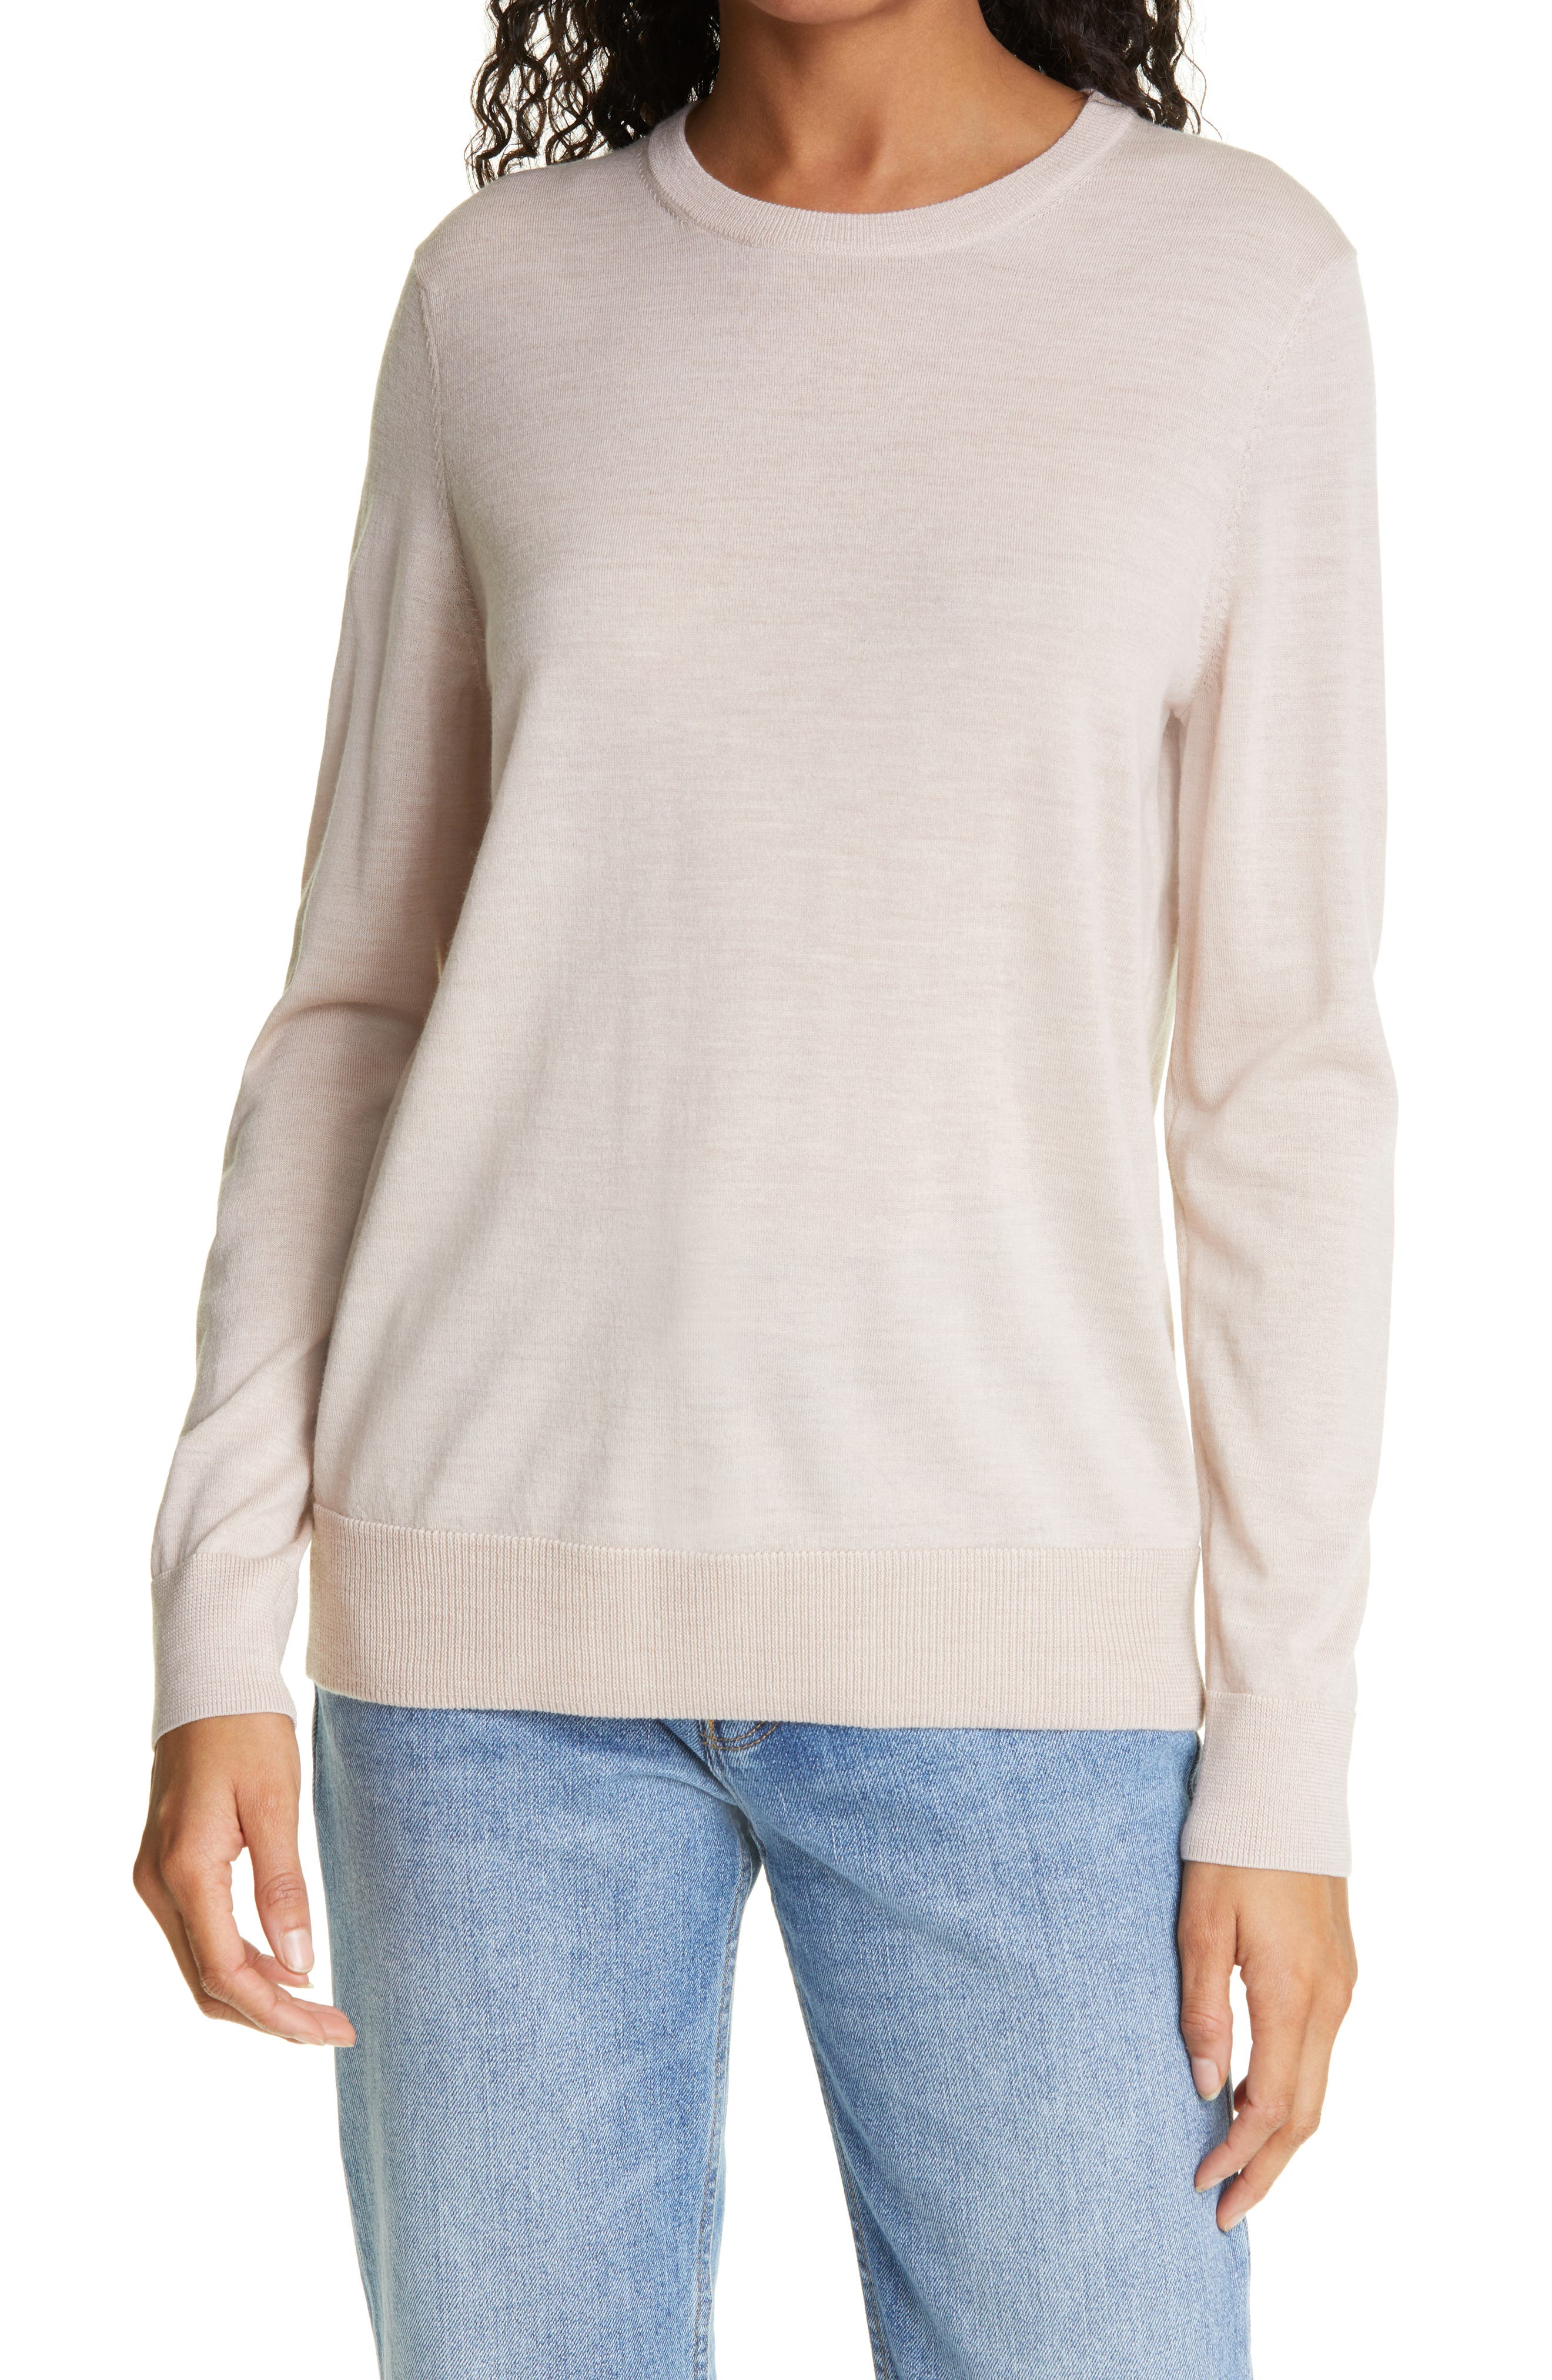 Crosby Merino Wool Crewneck Sweater